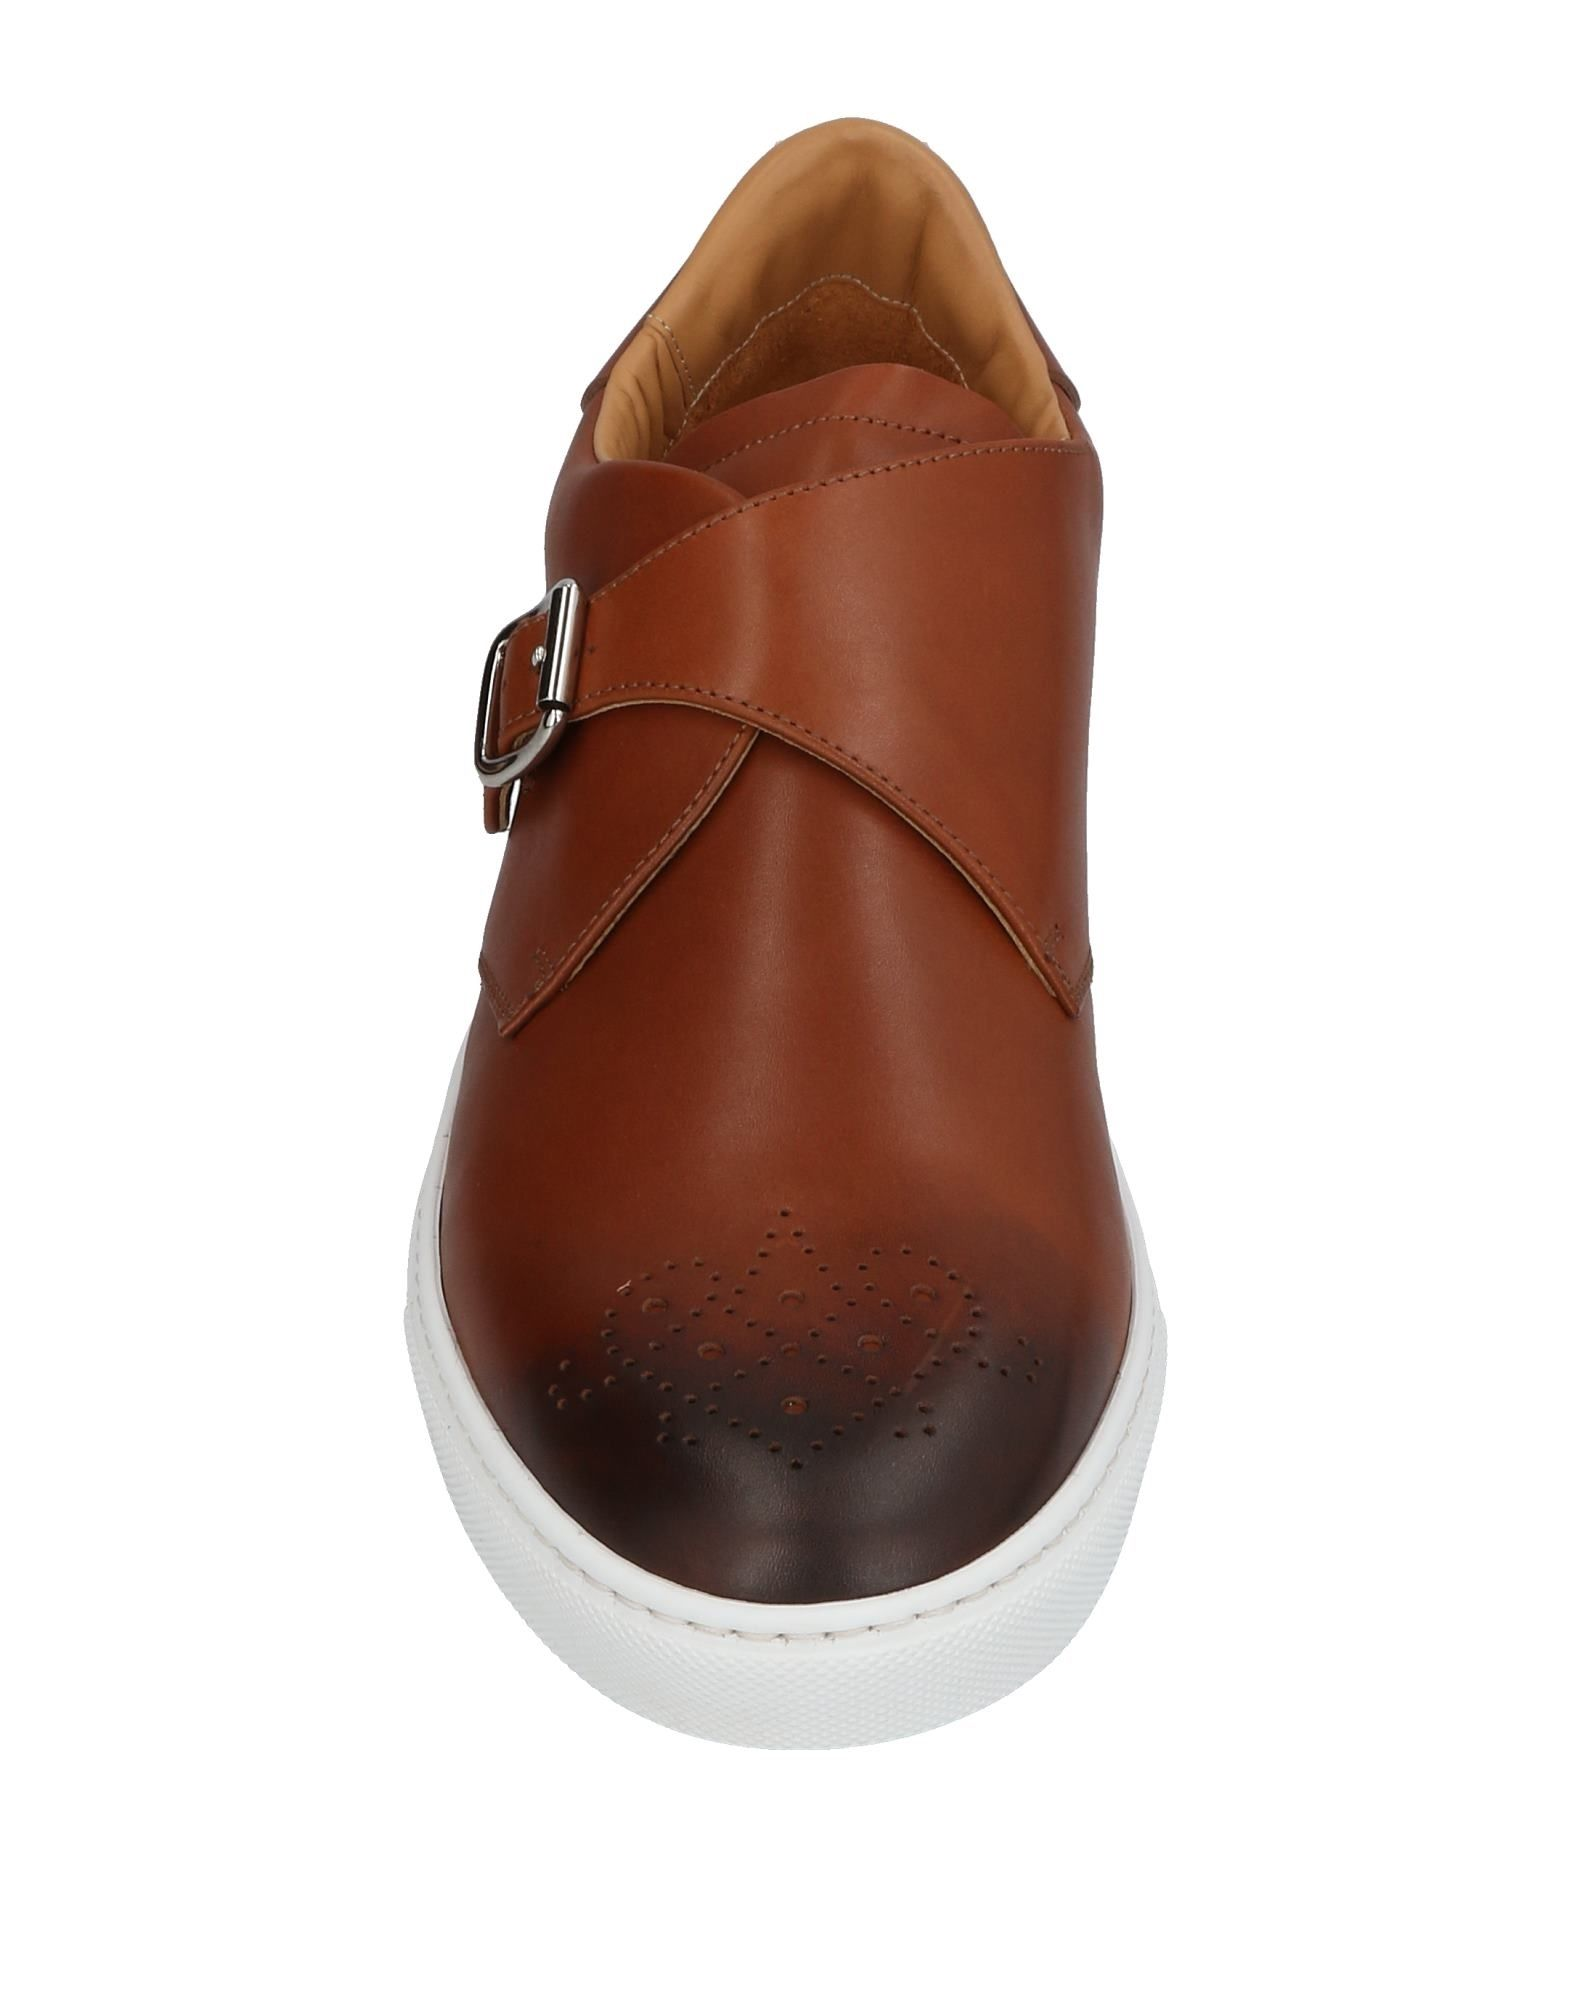 Dsquared2 11424187TJ Mokassins Herren  11424187TJ Dsquared2 Heiße Schuhe 047da6